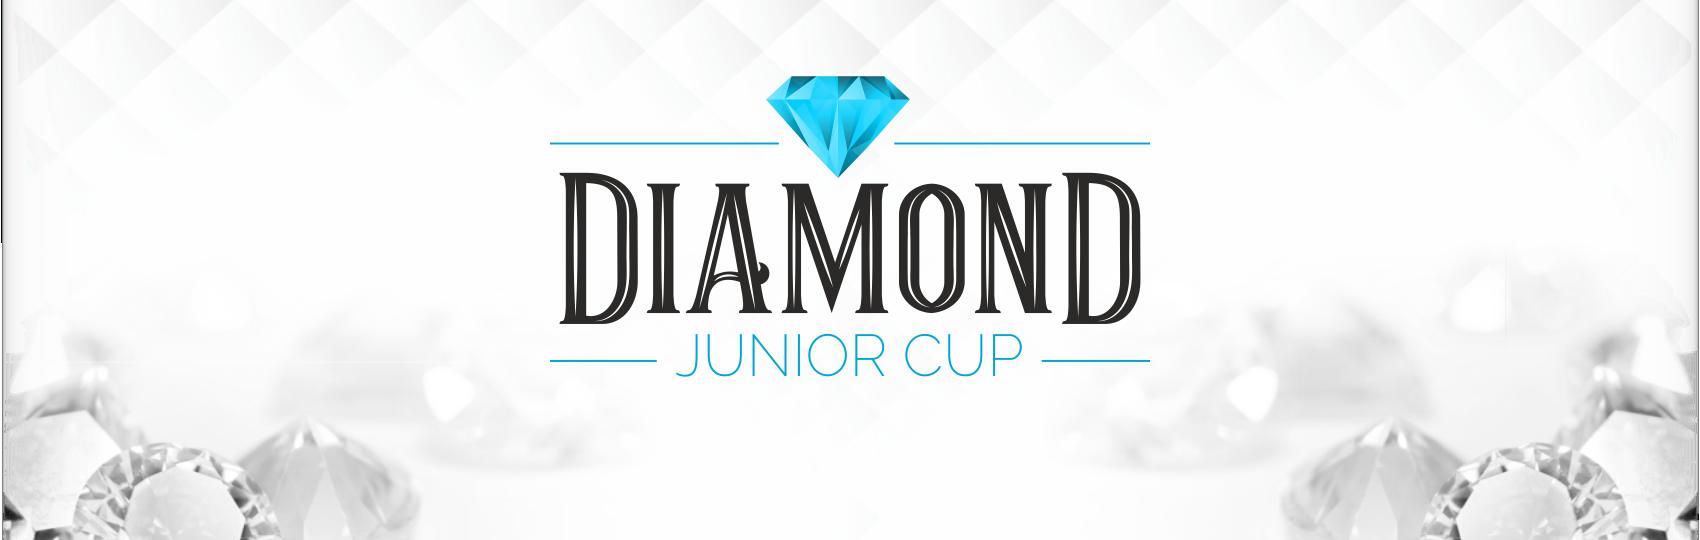 Diamond Junior Cup